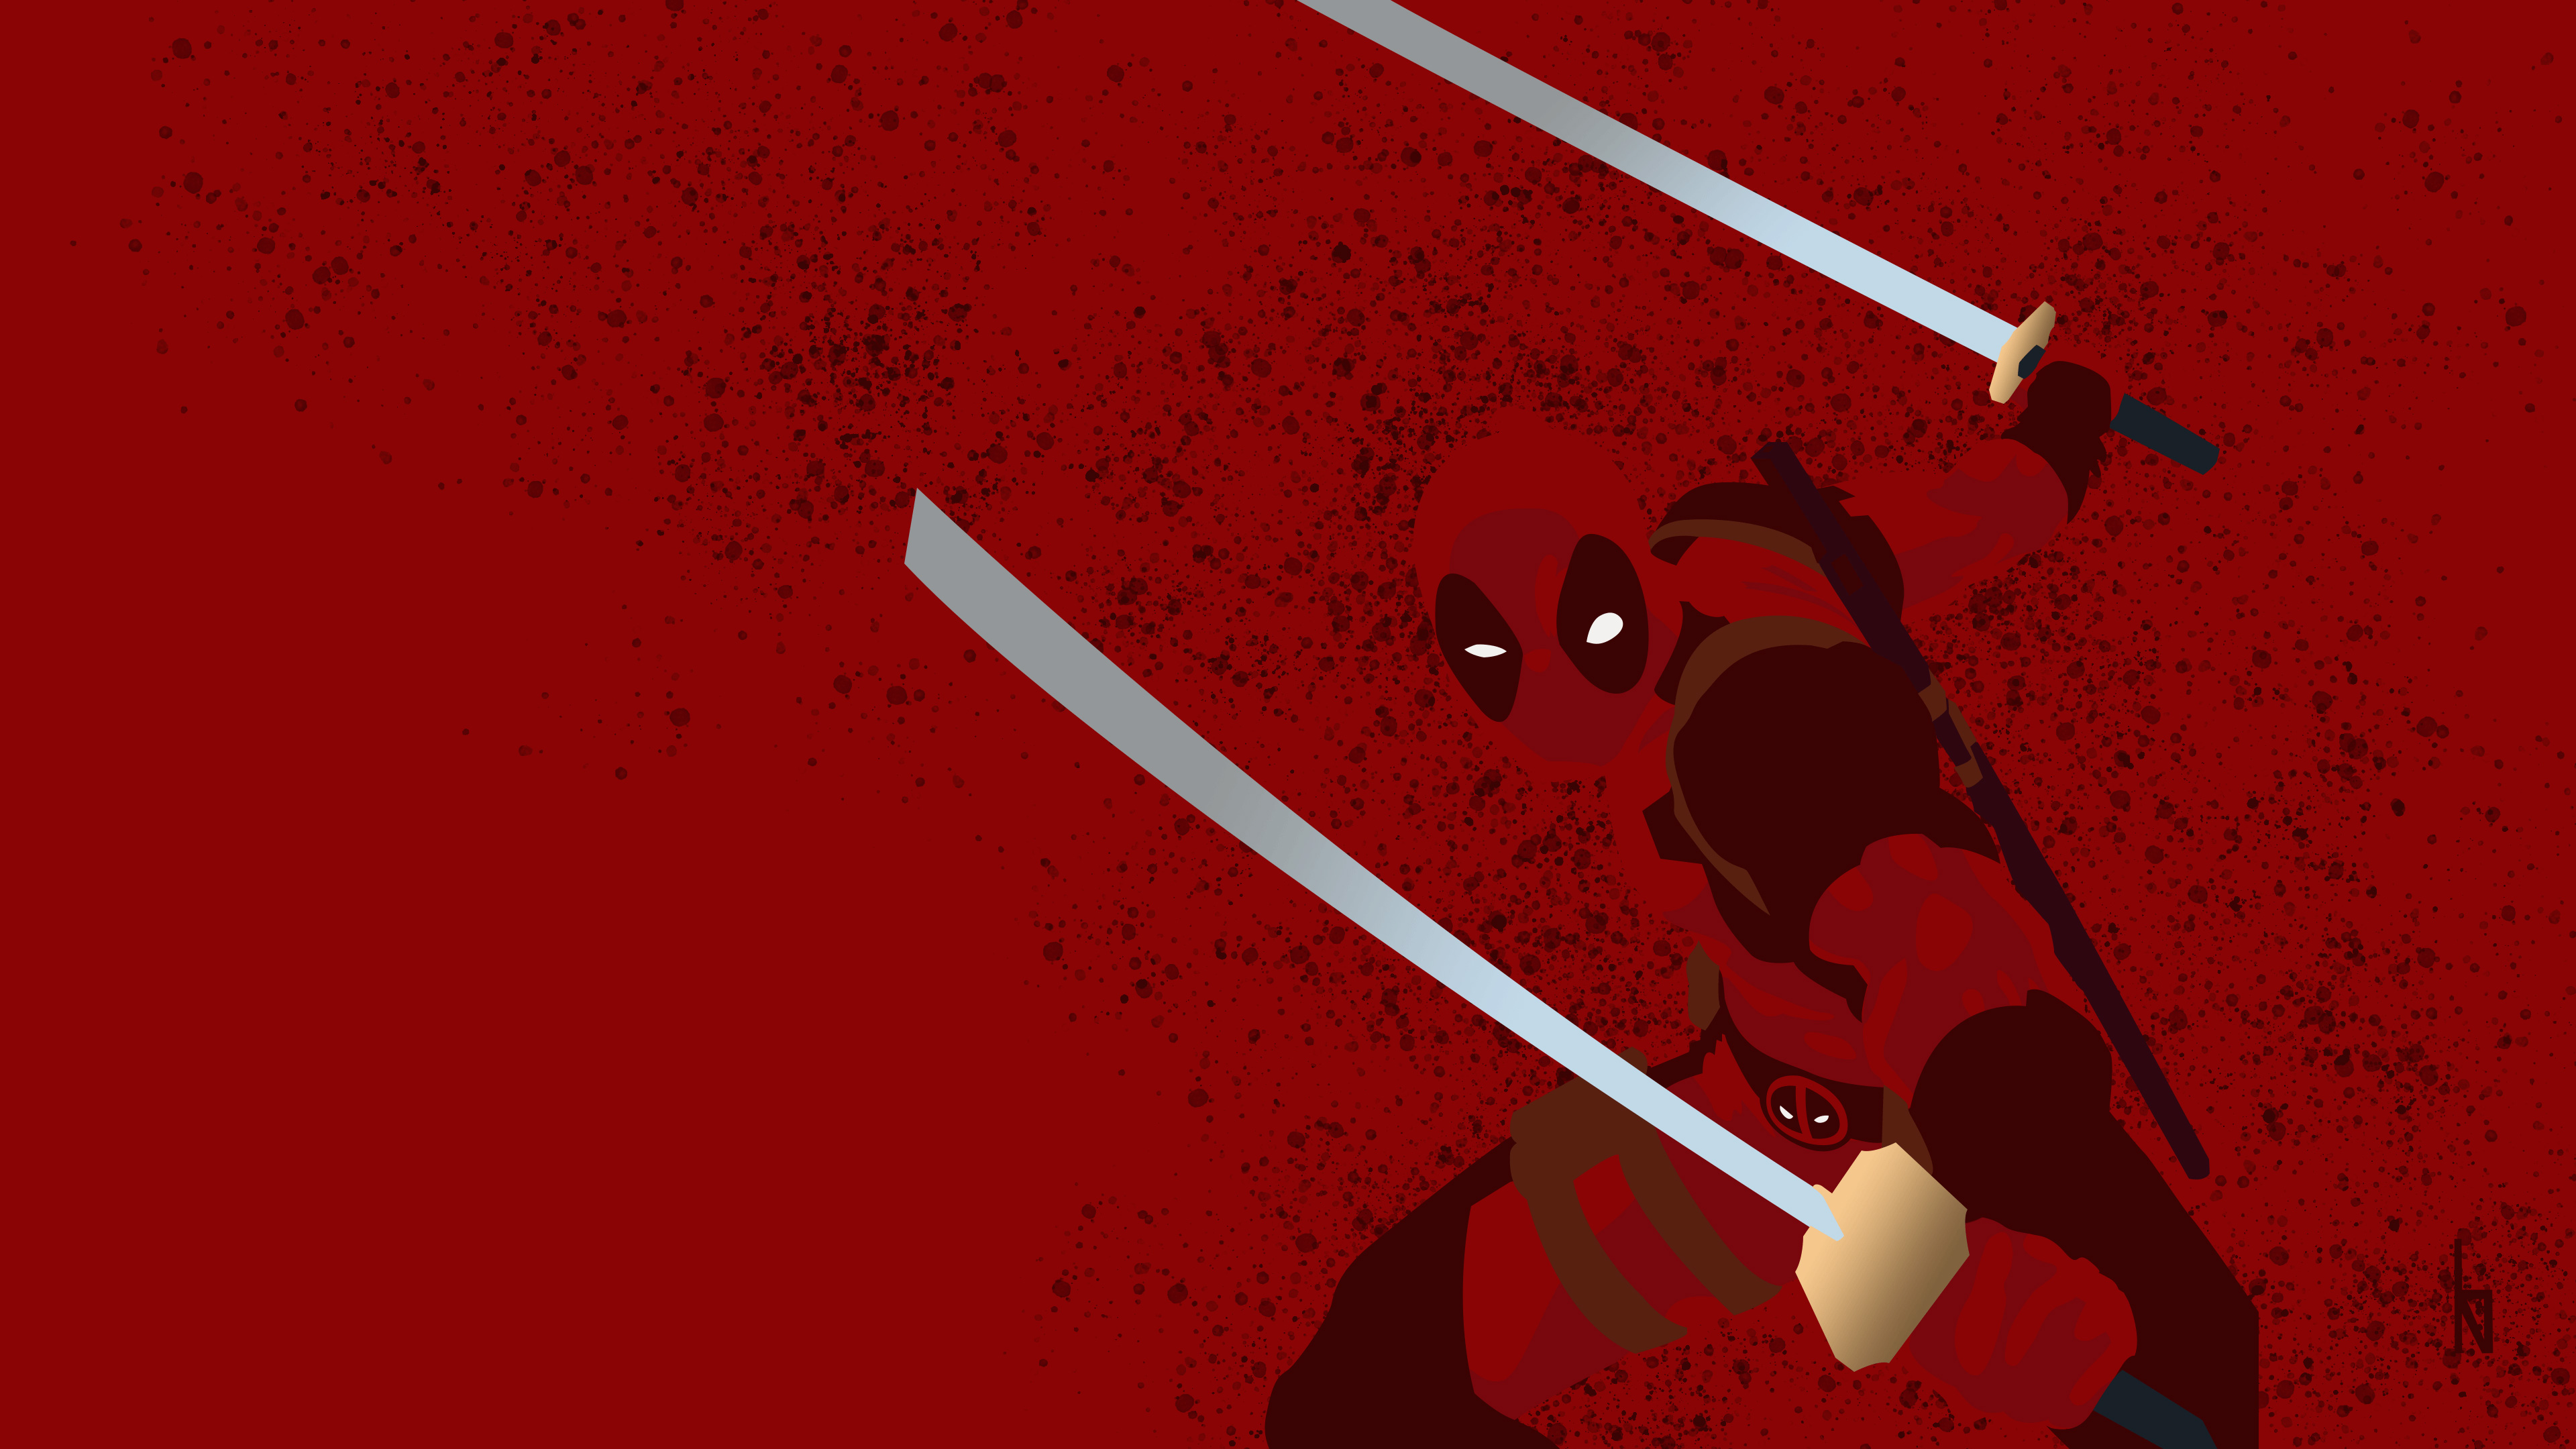 Deadpool Minimalist Background 4k Hd Superheroes 4k Wallpapers